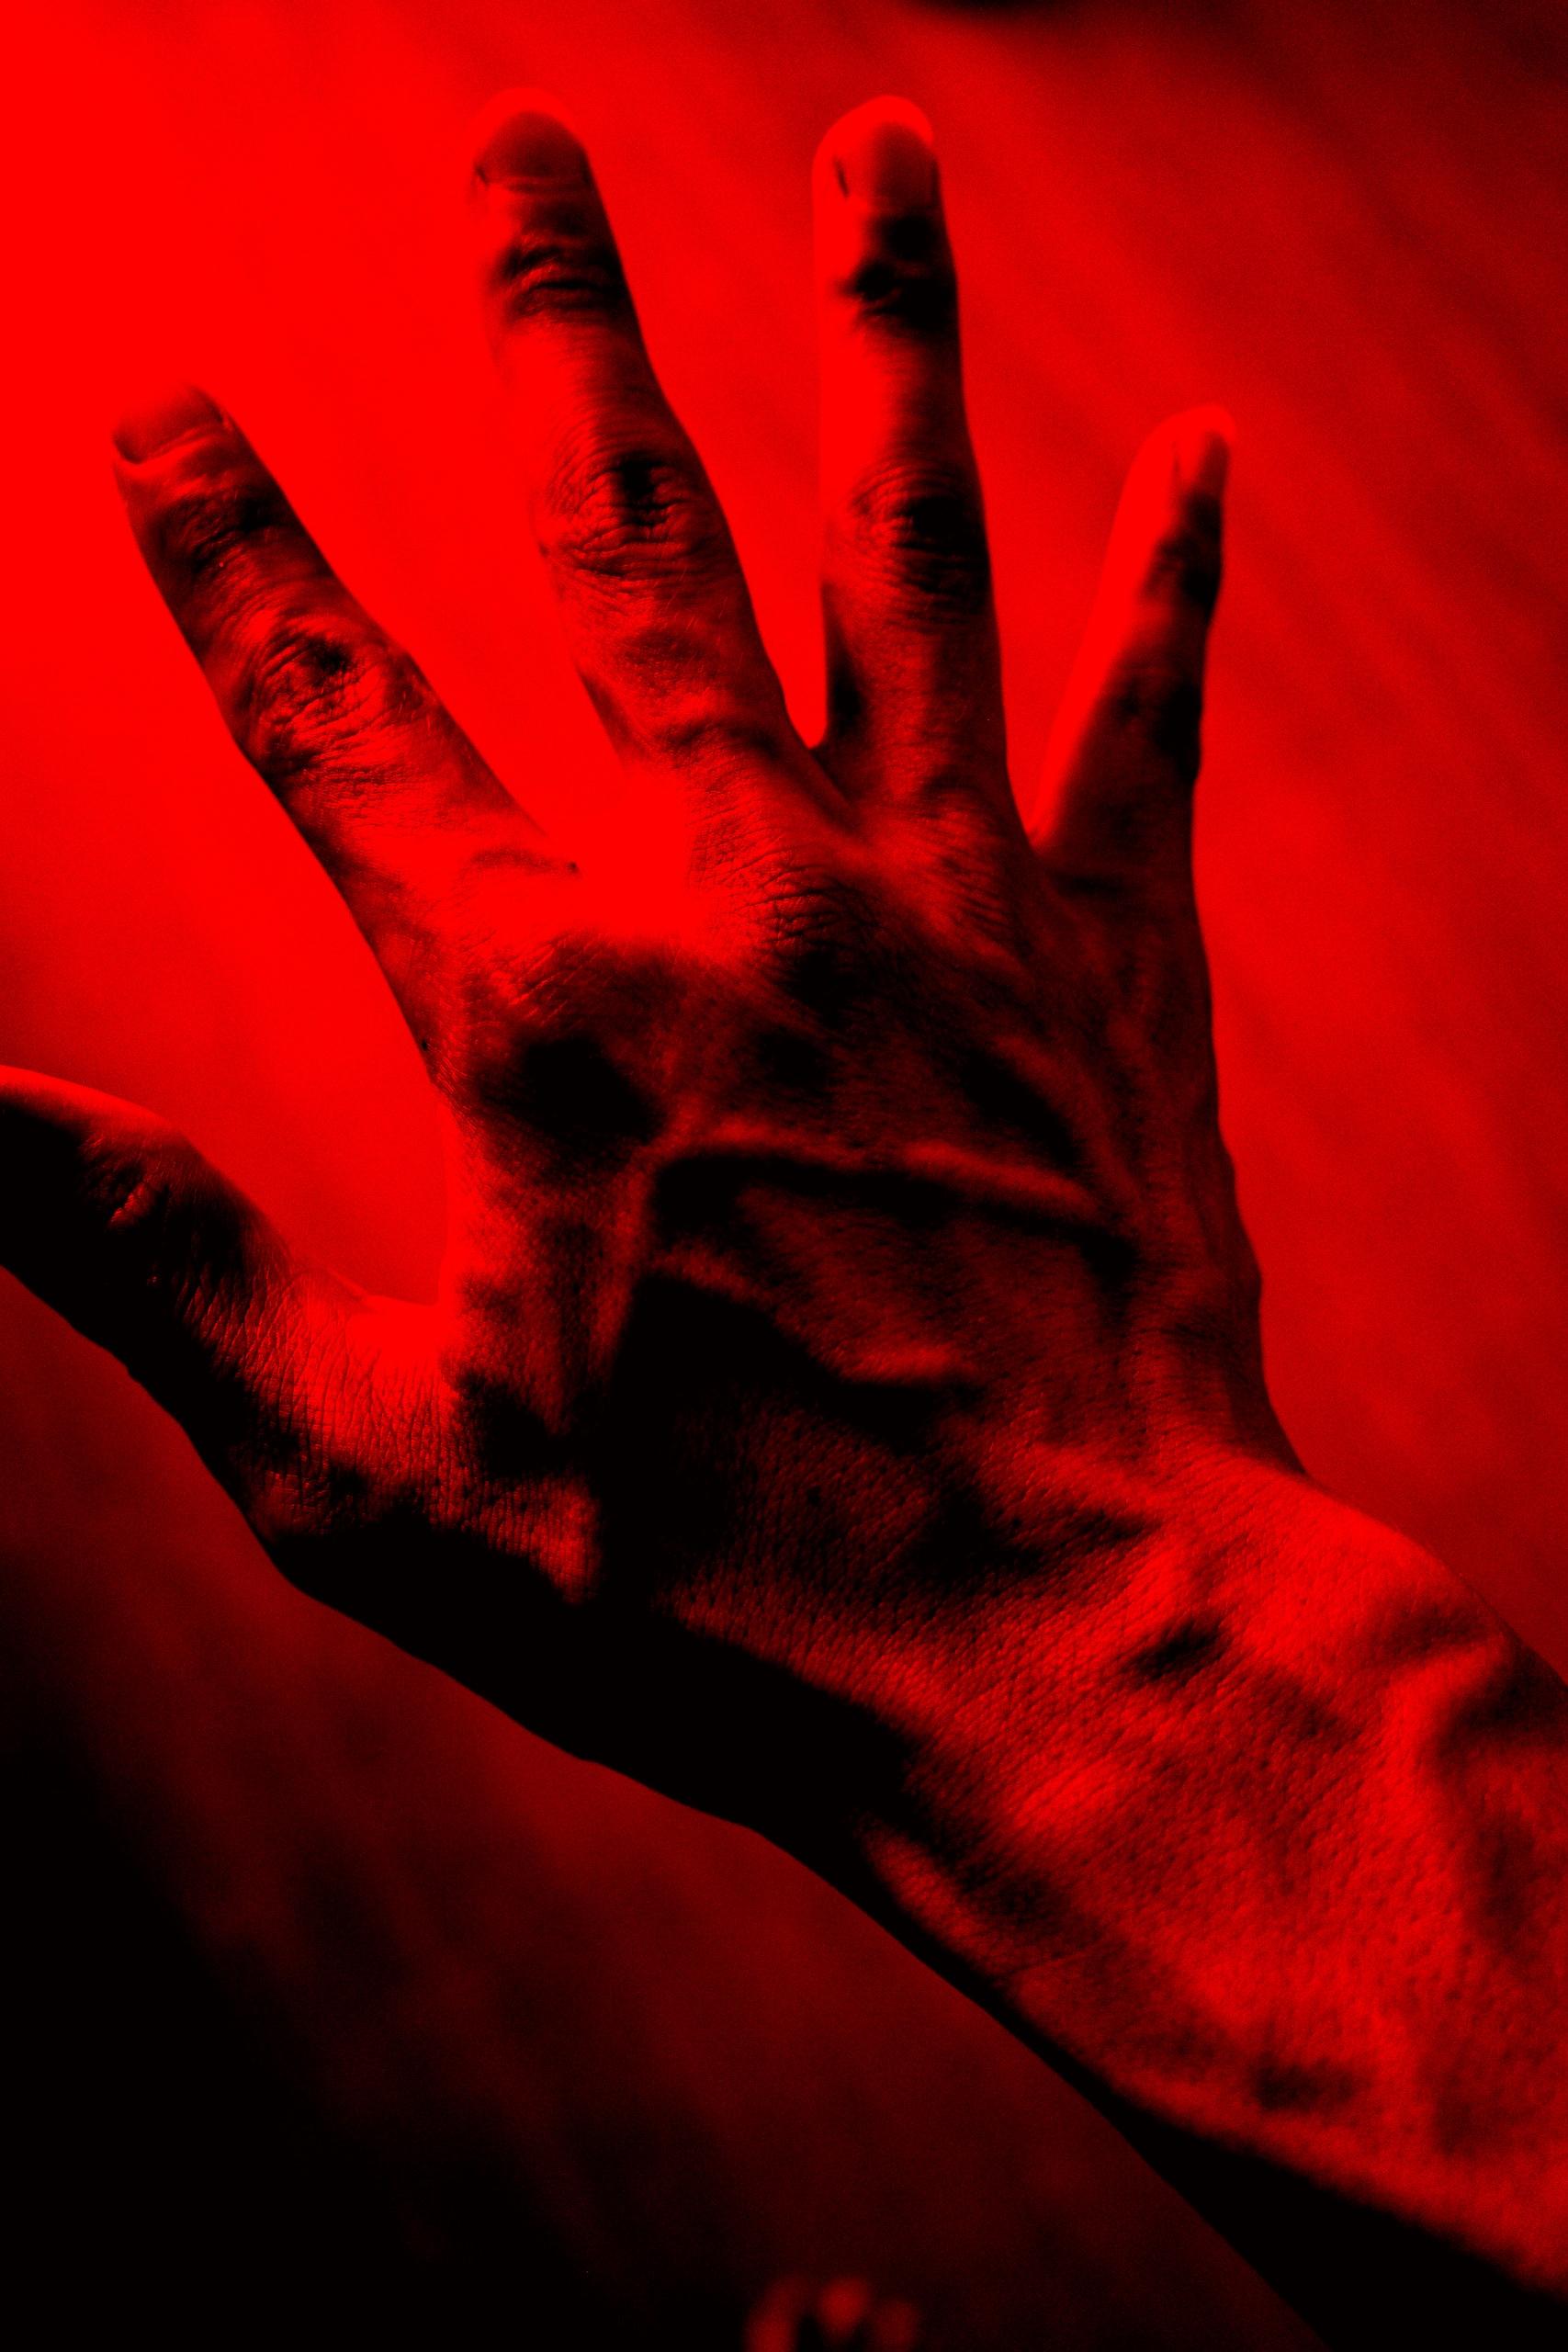 red hand ERIC KIM selfie